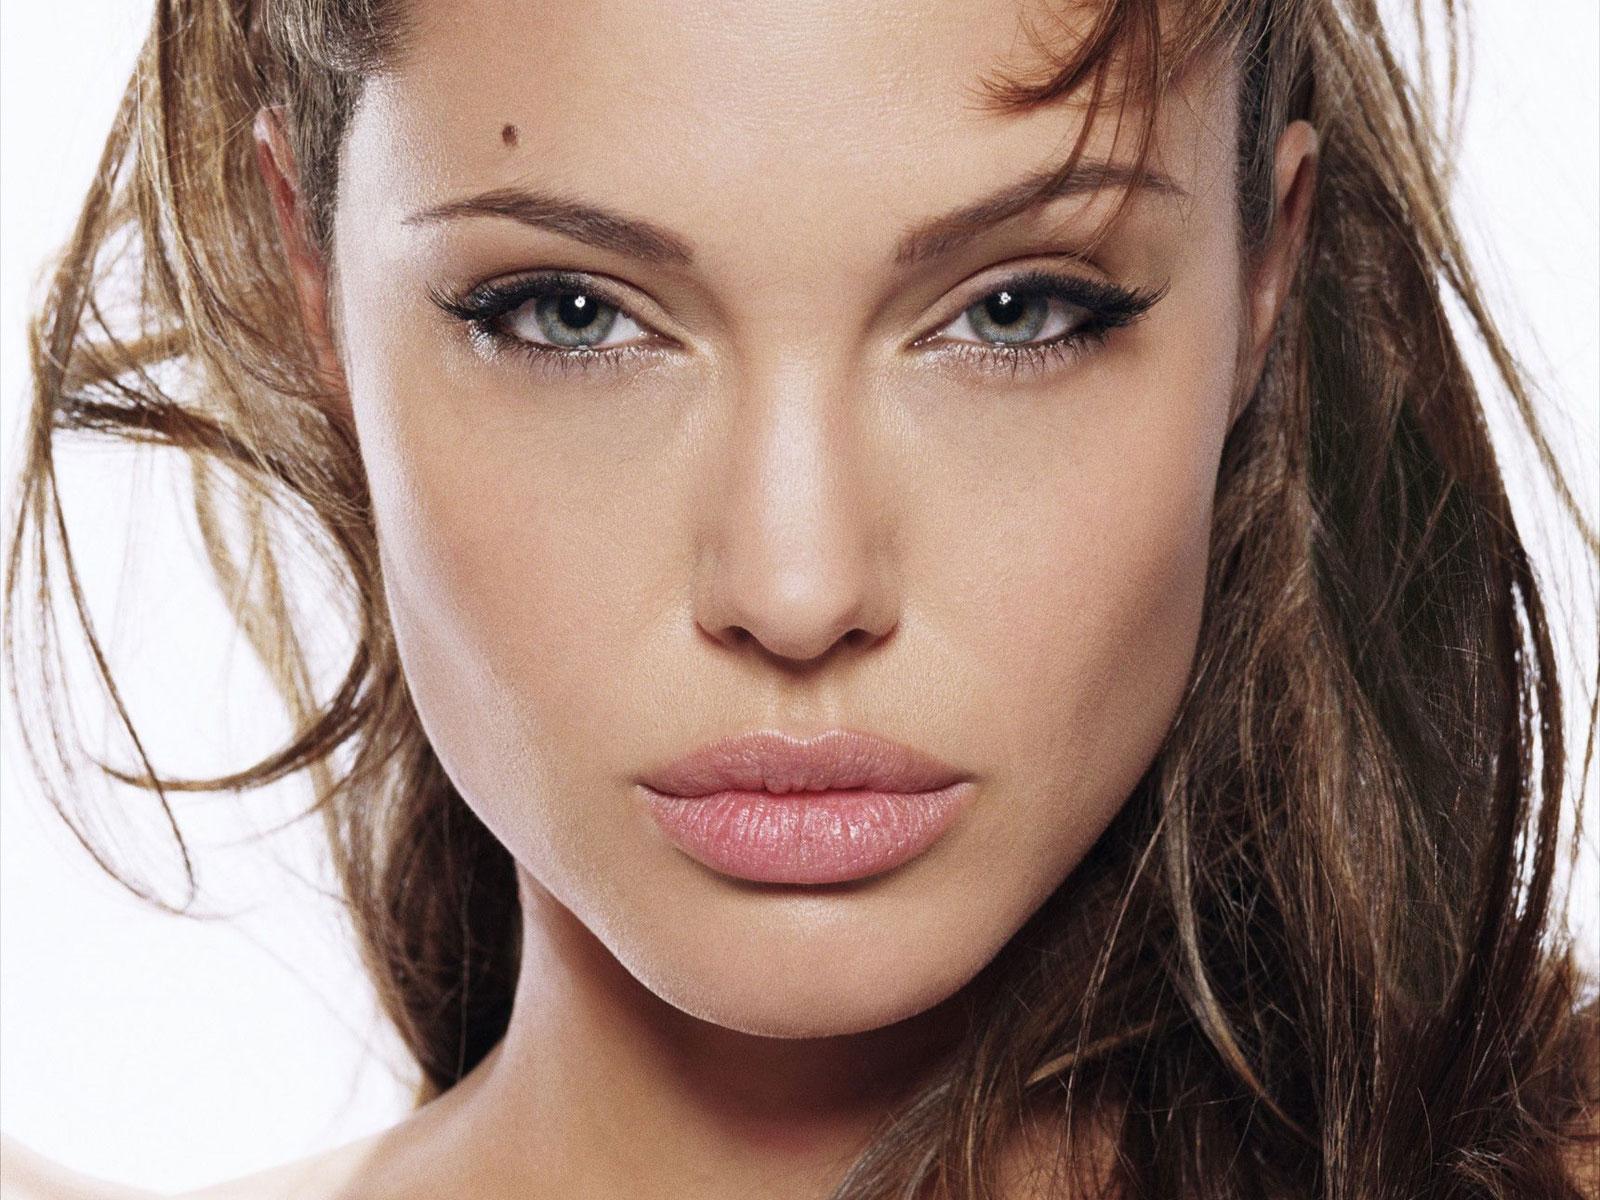 http://2.bp.blogspot.com/-aHlkTovy7Rk/T4CAoHCRr7I/AAAAAAAABrM/7_g2tlGNiY4/s1600/Angelina-angelina-jolie-34942_1600_1200%5B1%5D.jpg